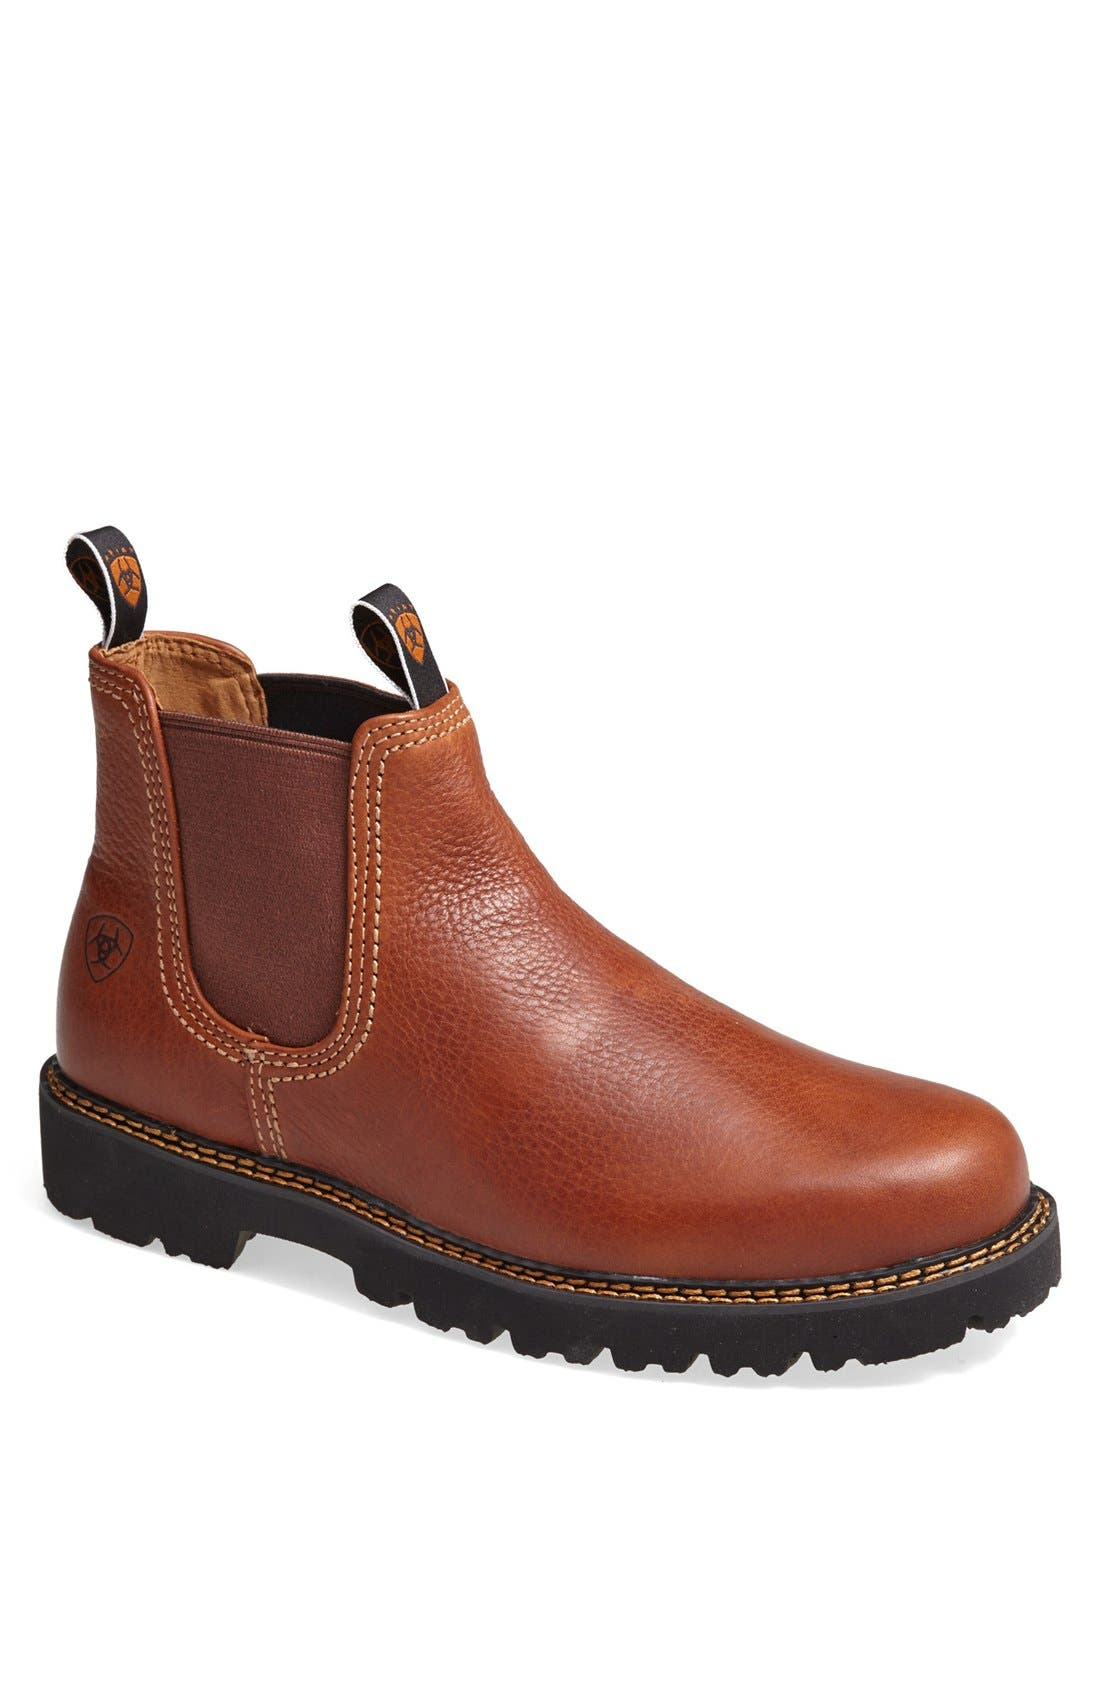 'Spot Hog' Chelsea Boot,                         Main,                         color, PEANUT